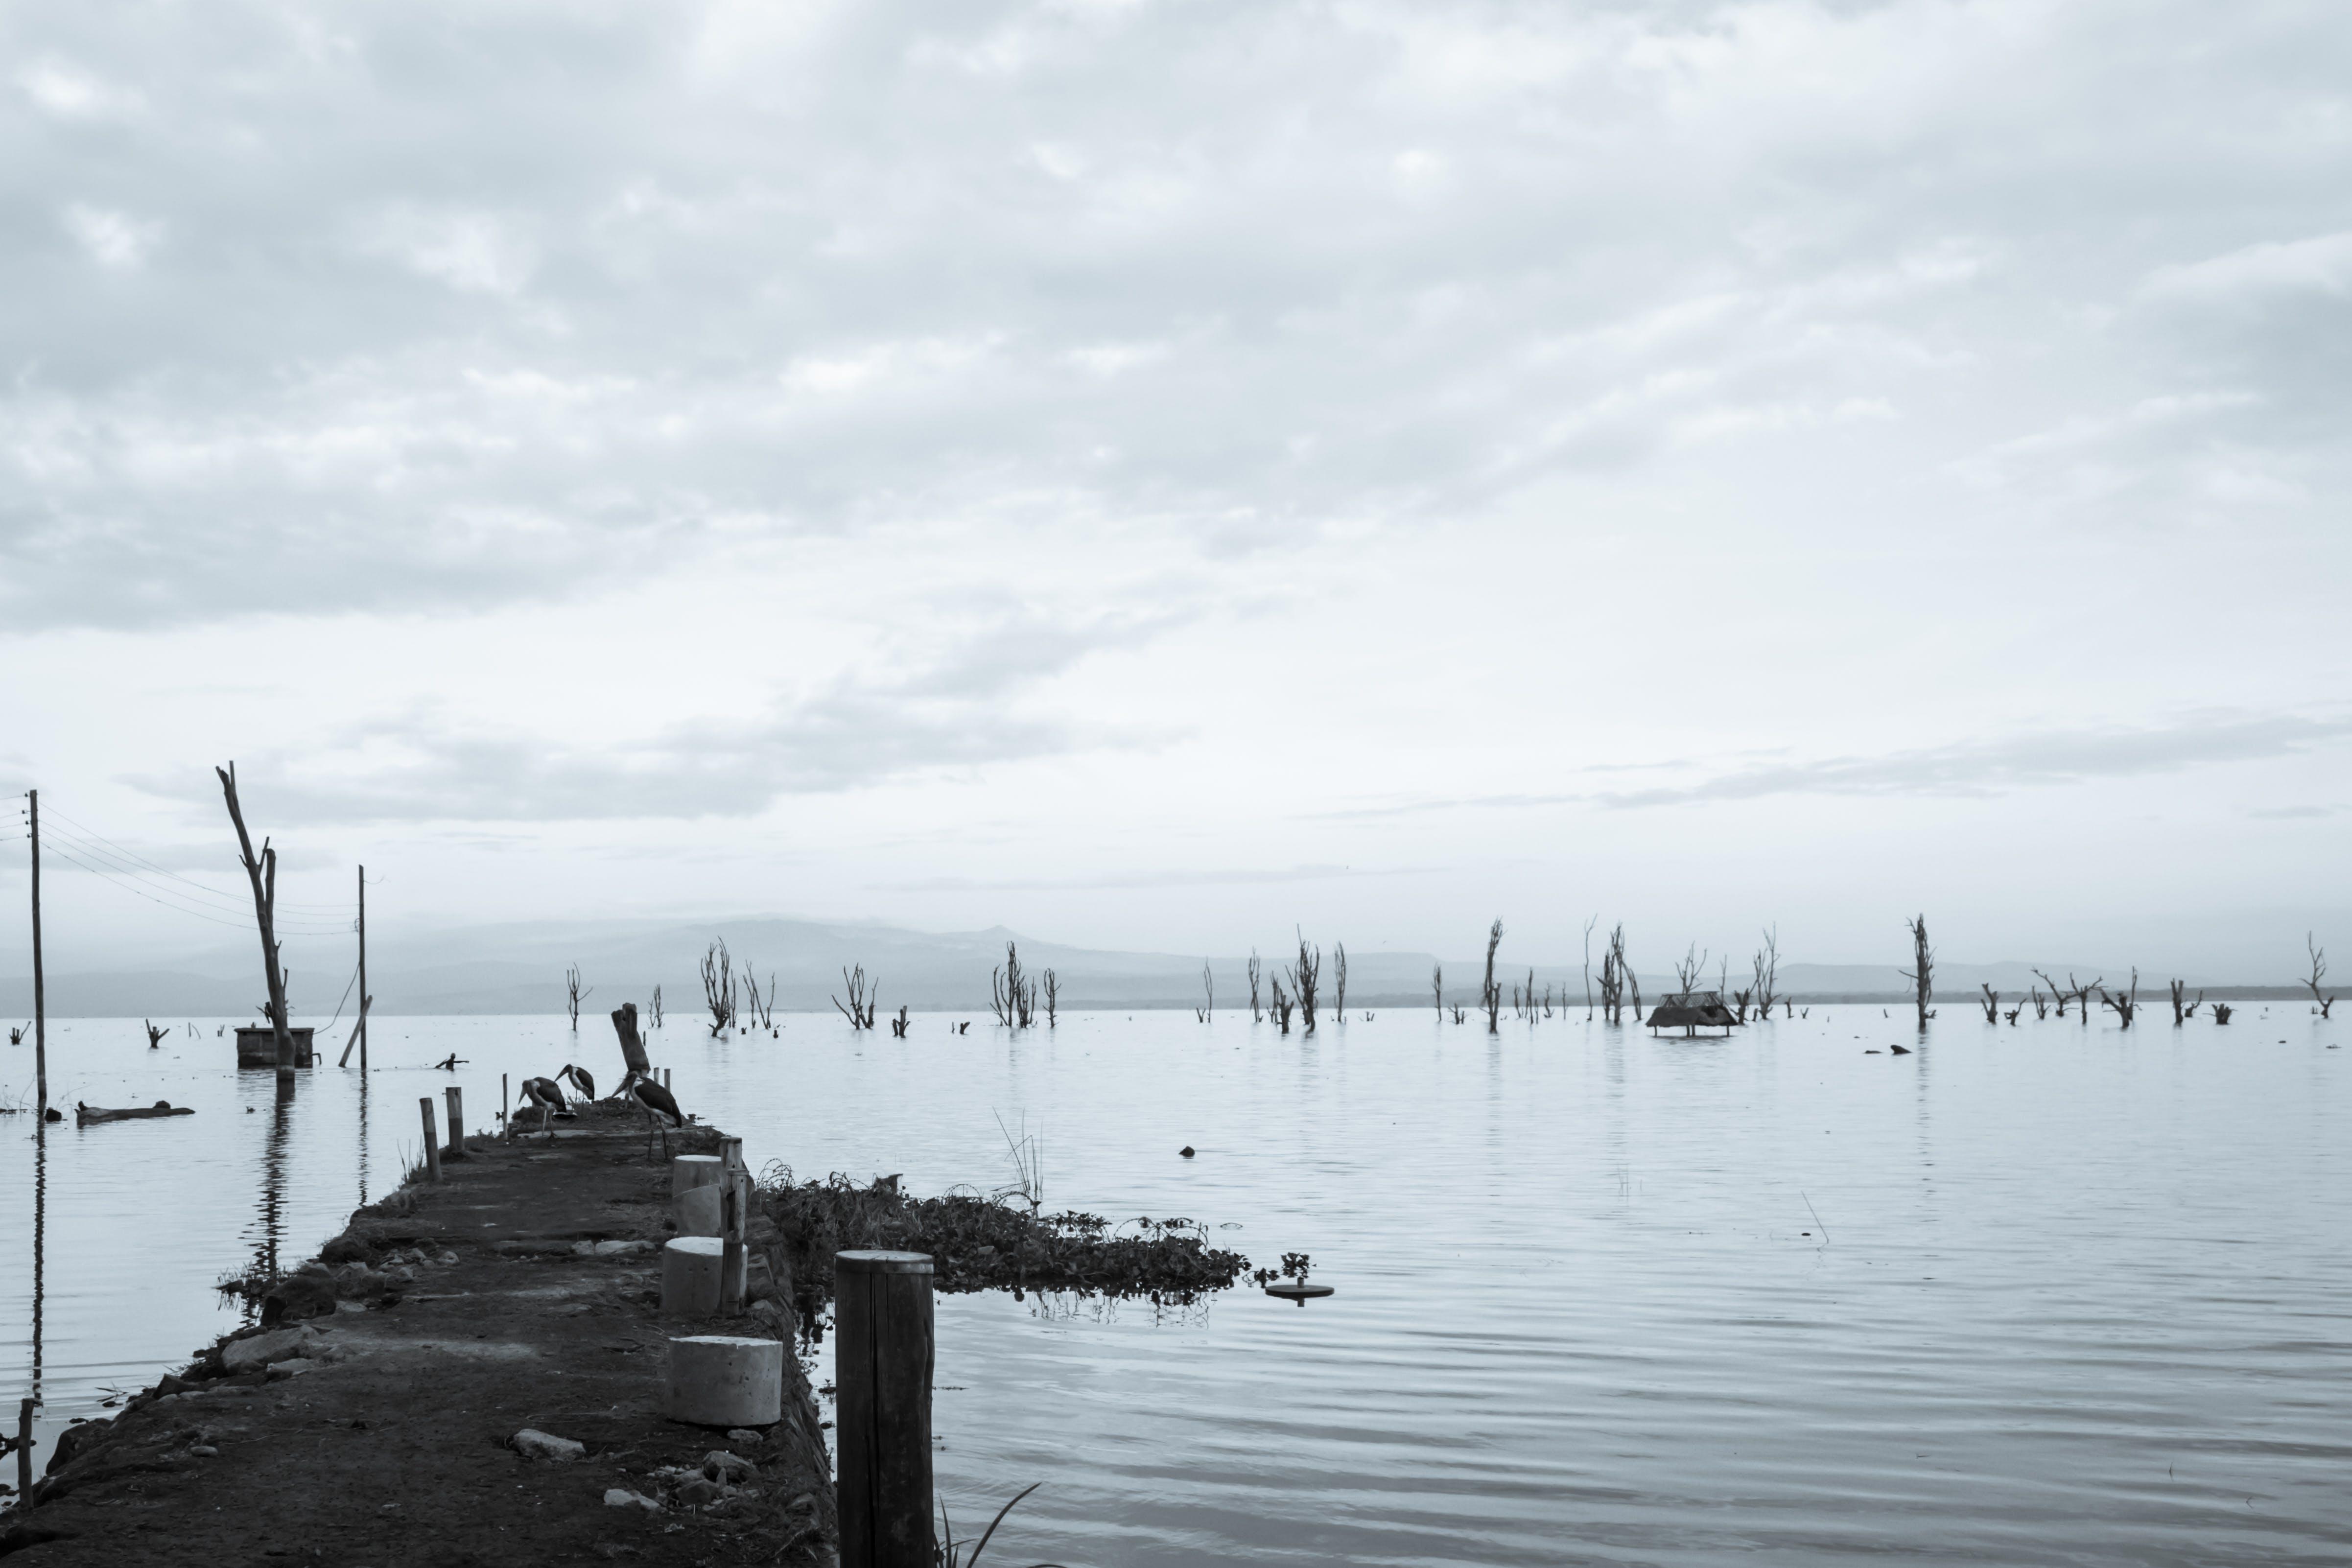 Free stock photo of lake pier